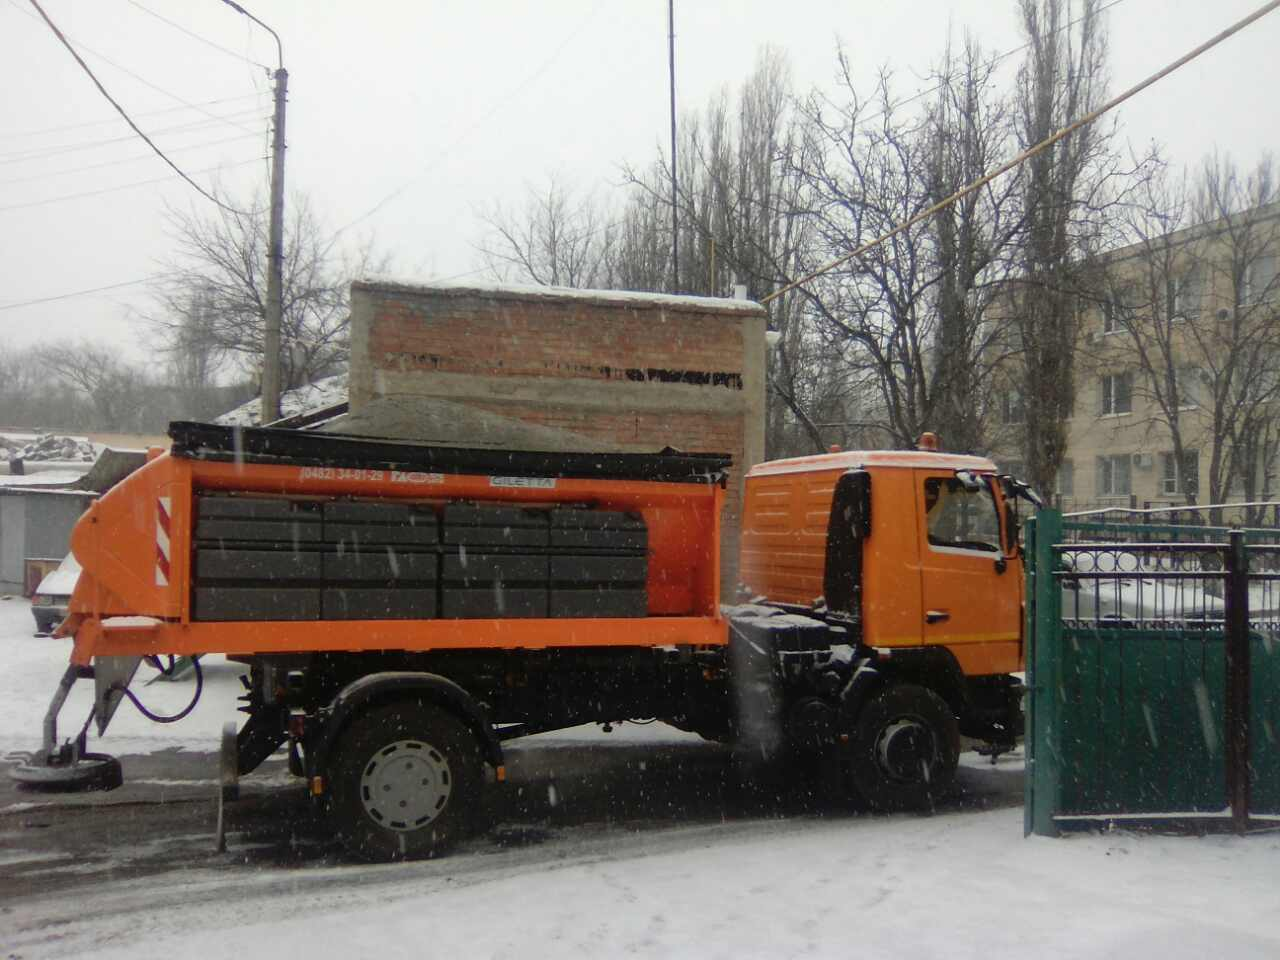 Комунальна техніка виїхала на посипку вулиць Кропивницького. ФОТО - 2 - Життя - Без Купюр